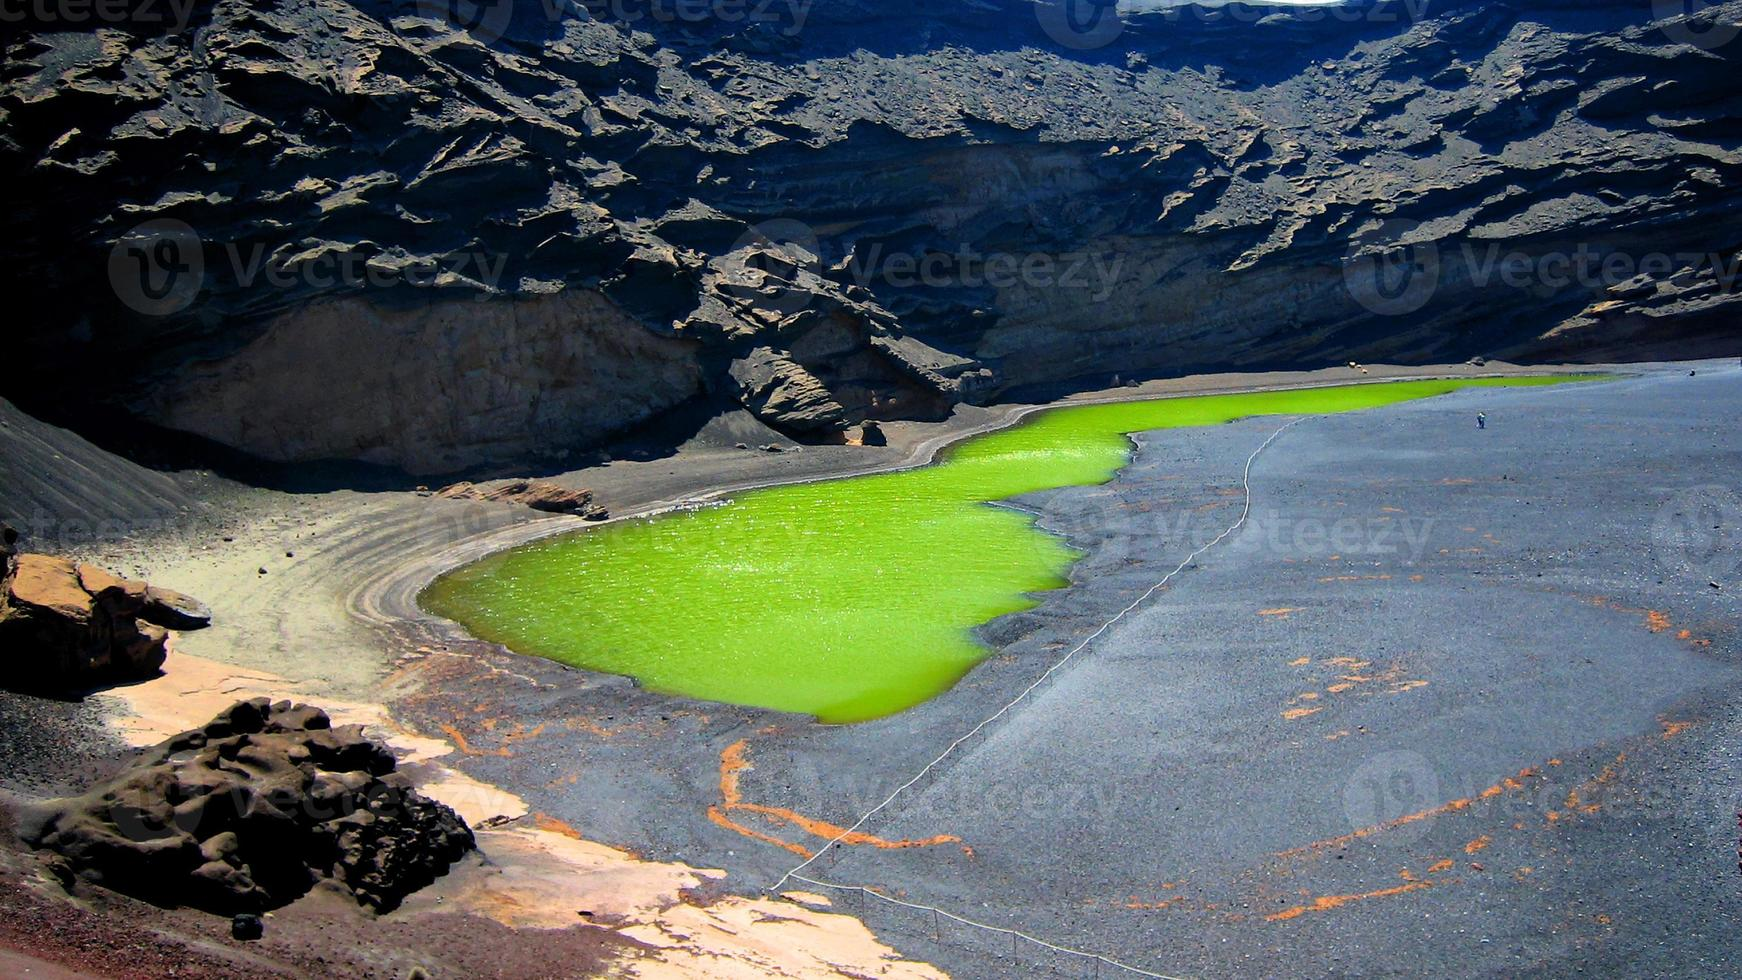 lac vert à lanzarote photo